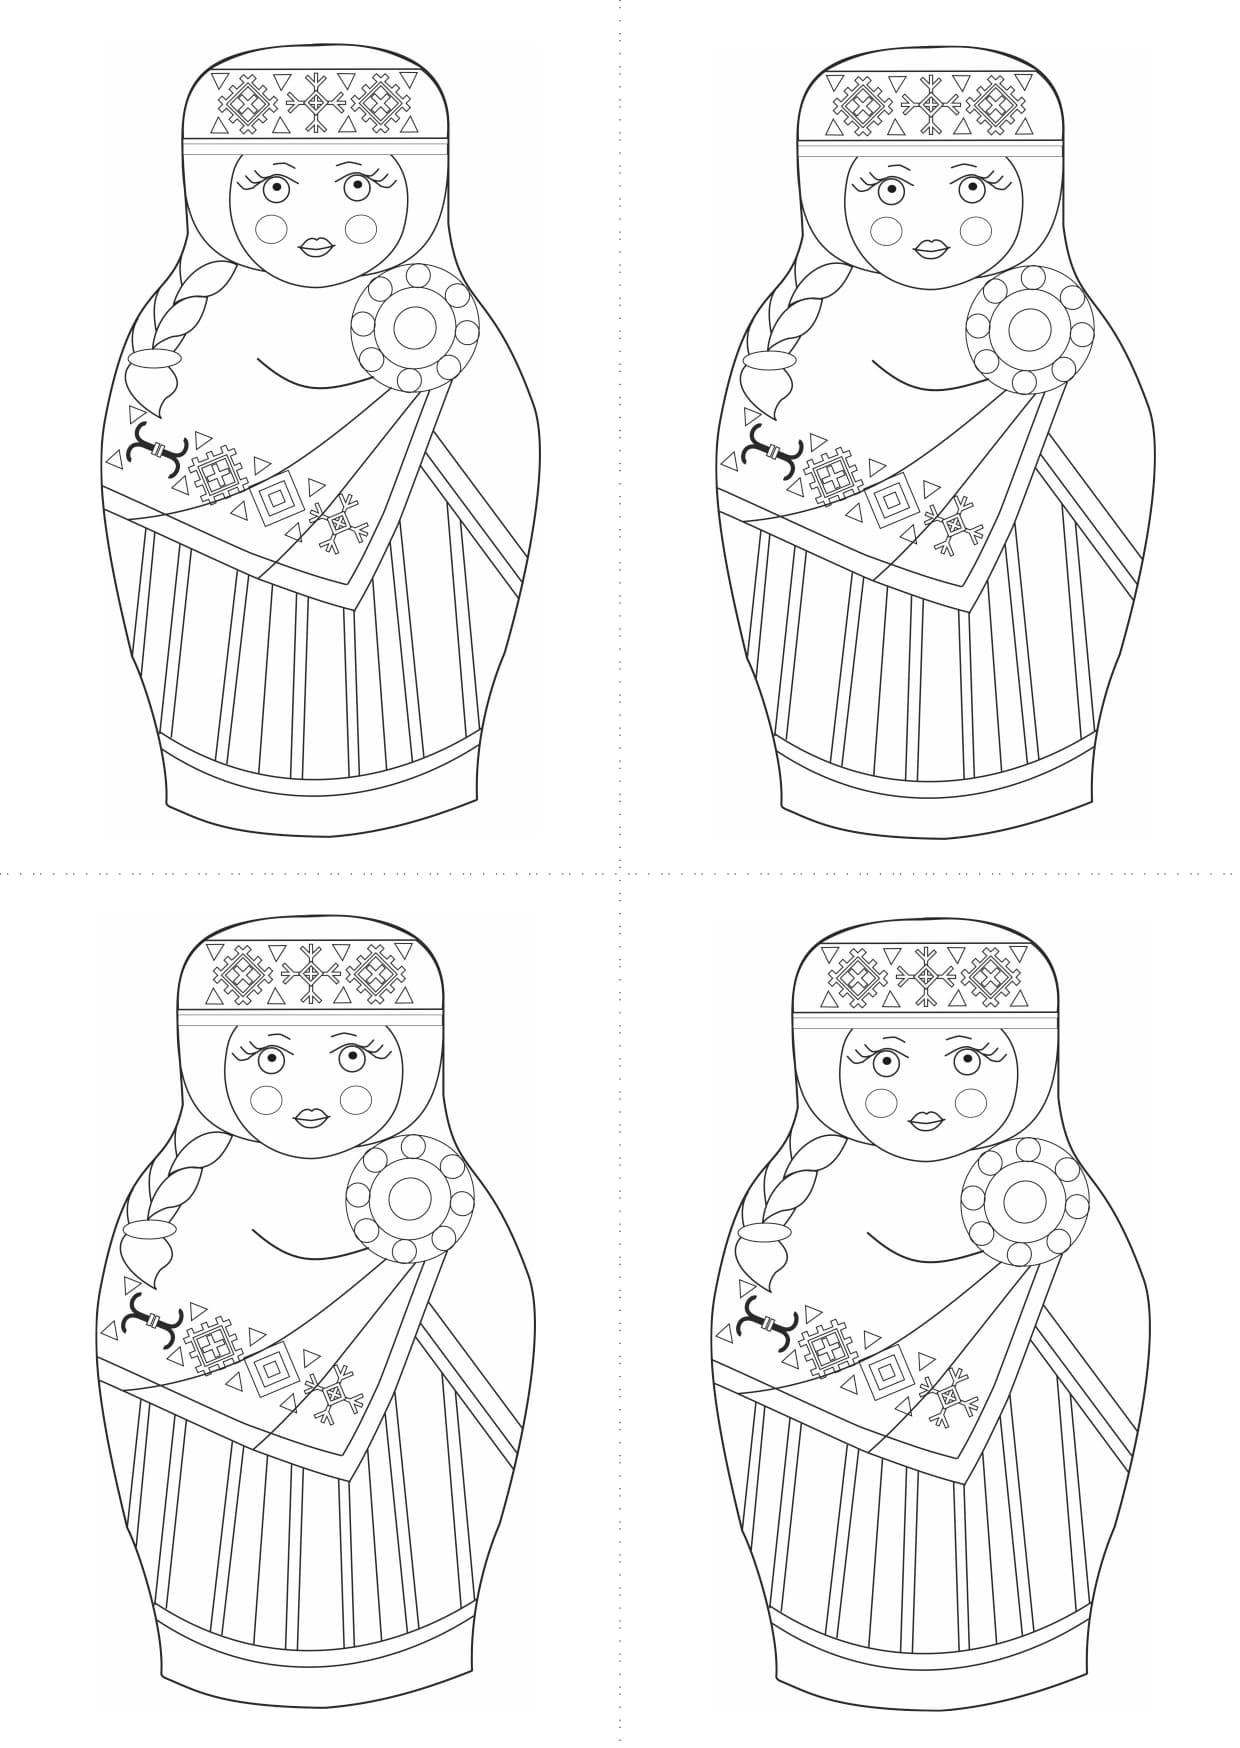 Раскраска шаблон матрёшки латышки для рисования